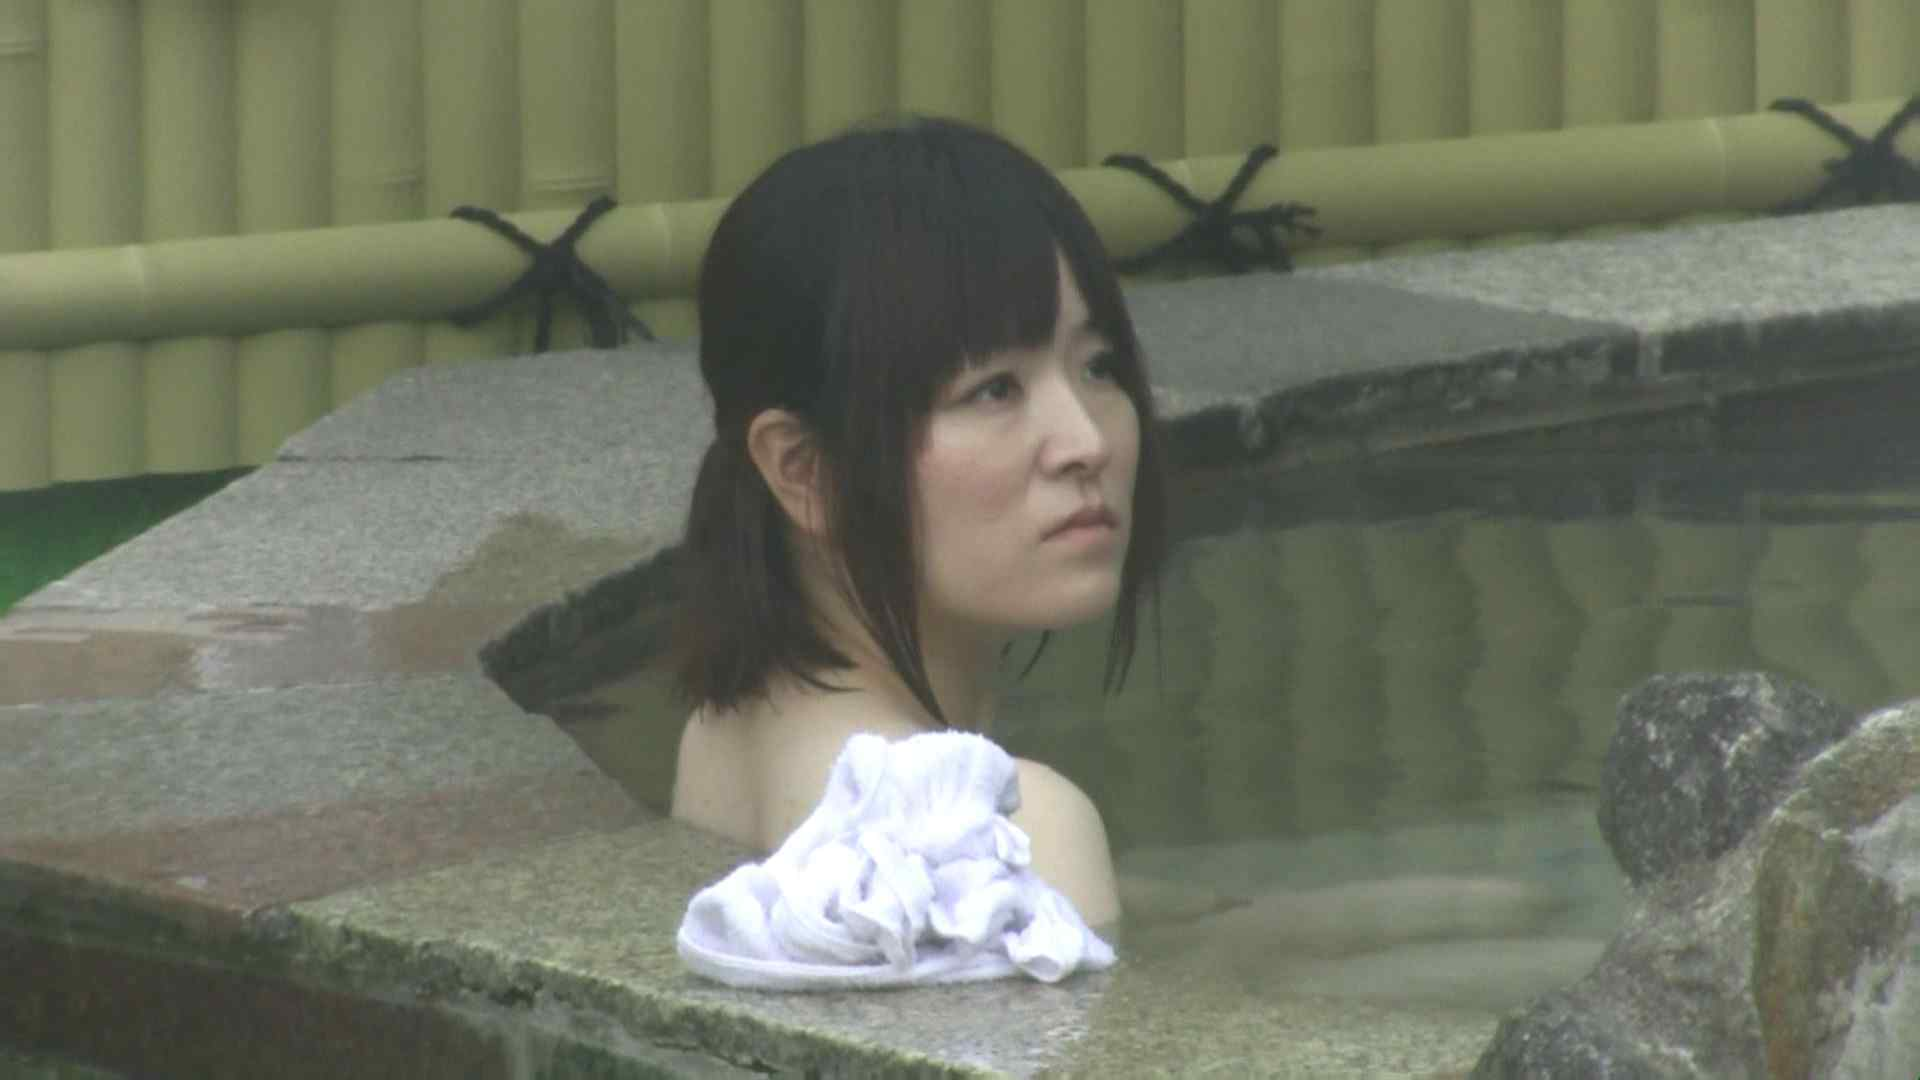 Aquaな露天風呂Vol.606 露天 スケベ動画紹介 110枚 2